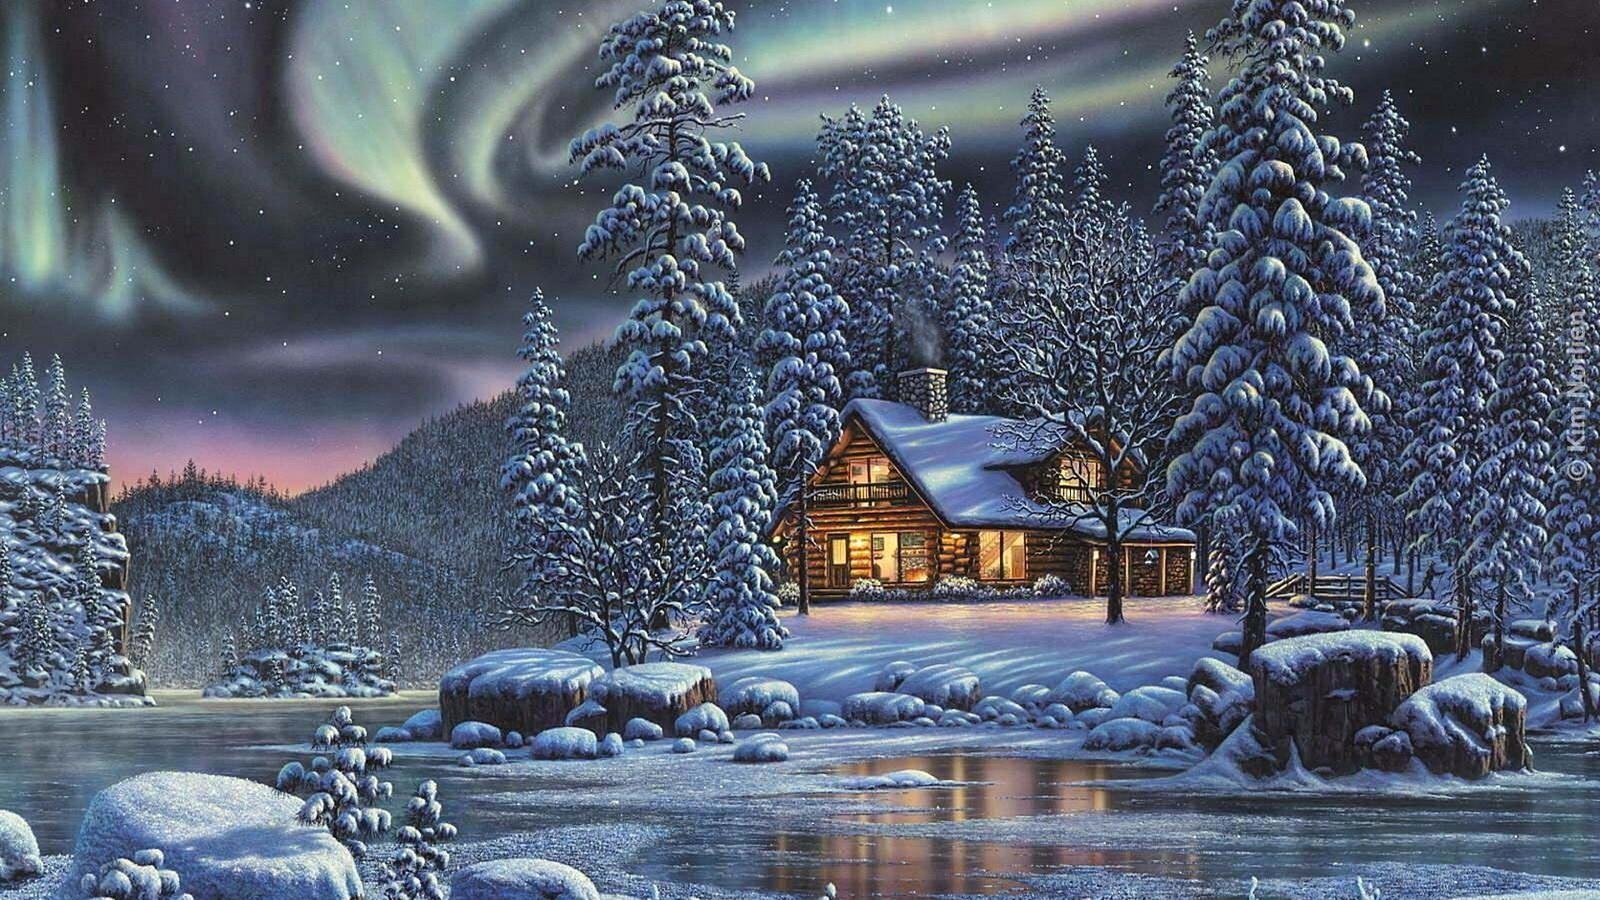 Открытки с зимним вечером и с зимним